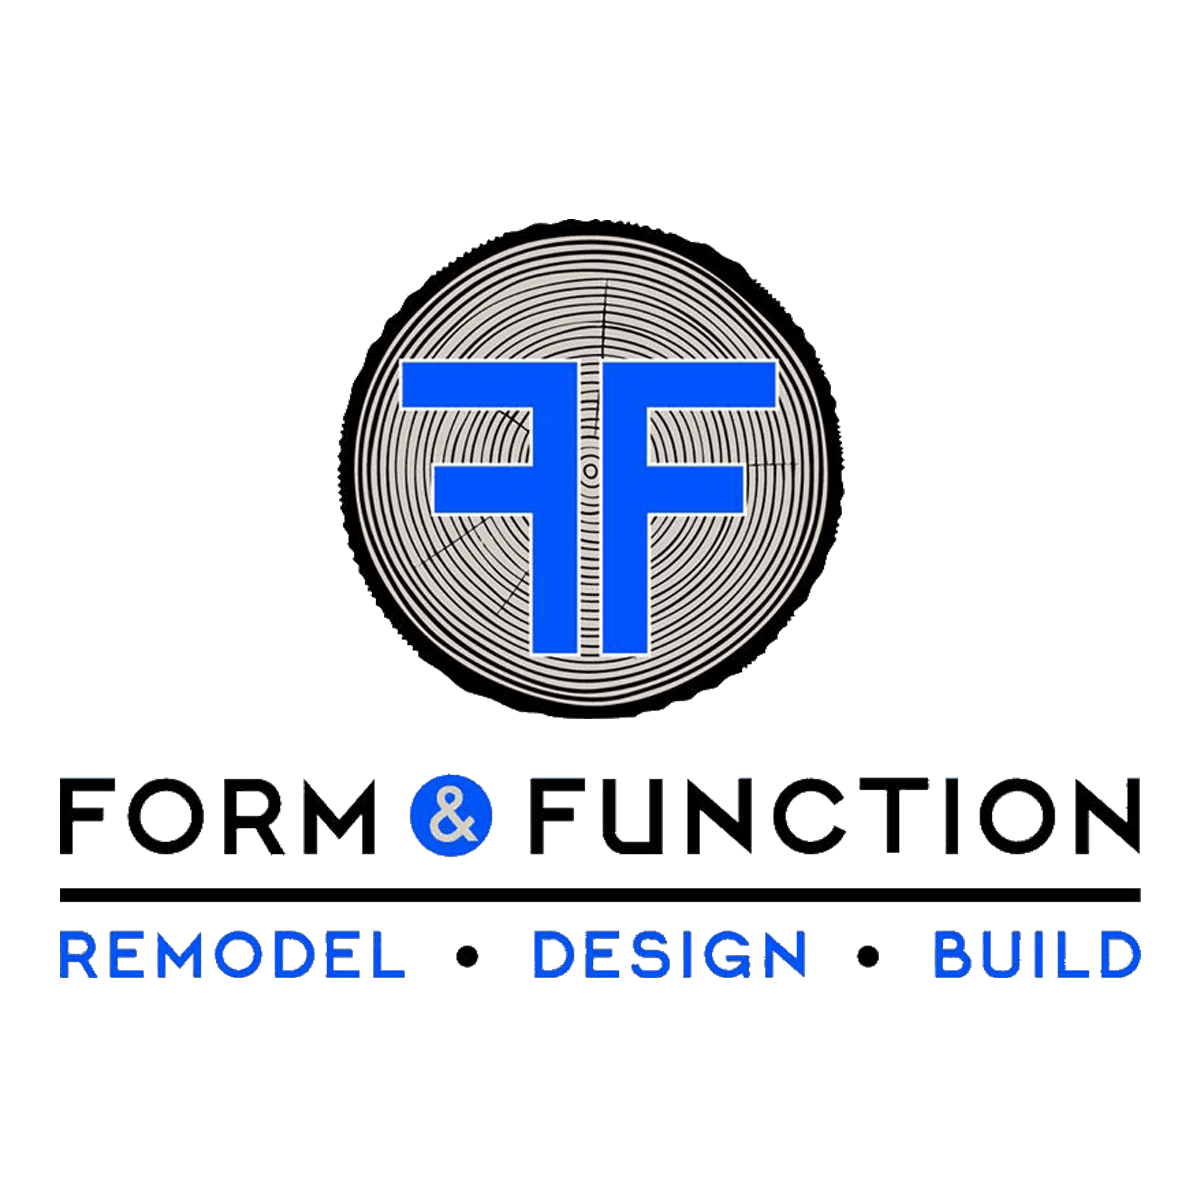 Form & Function logo